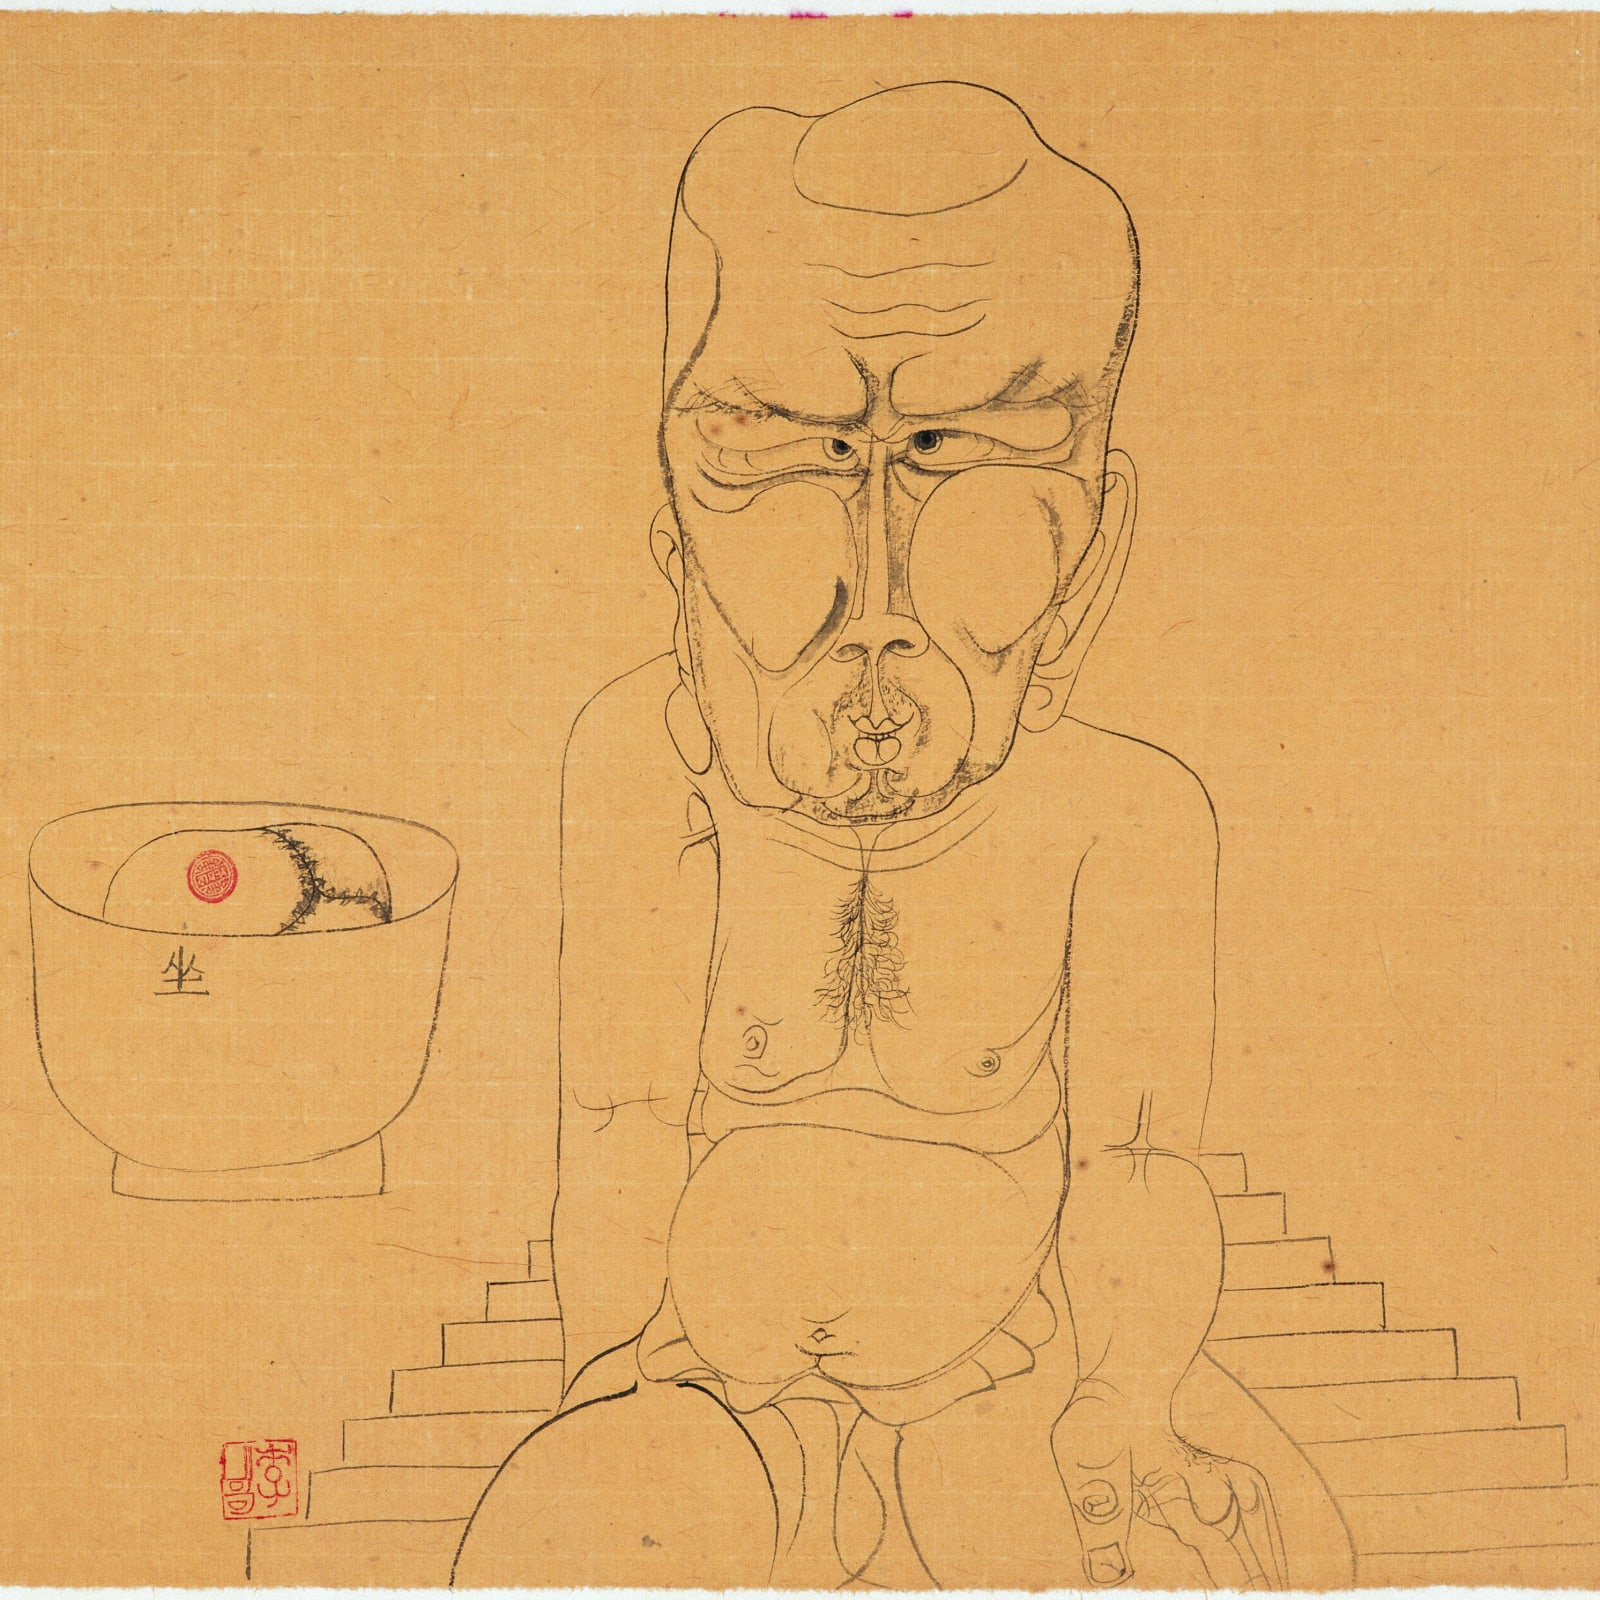 Li Jin 李津, Lhasa Drawing: Skull 拉萨白描:骷髅头, 1993